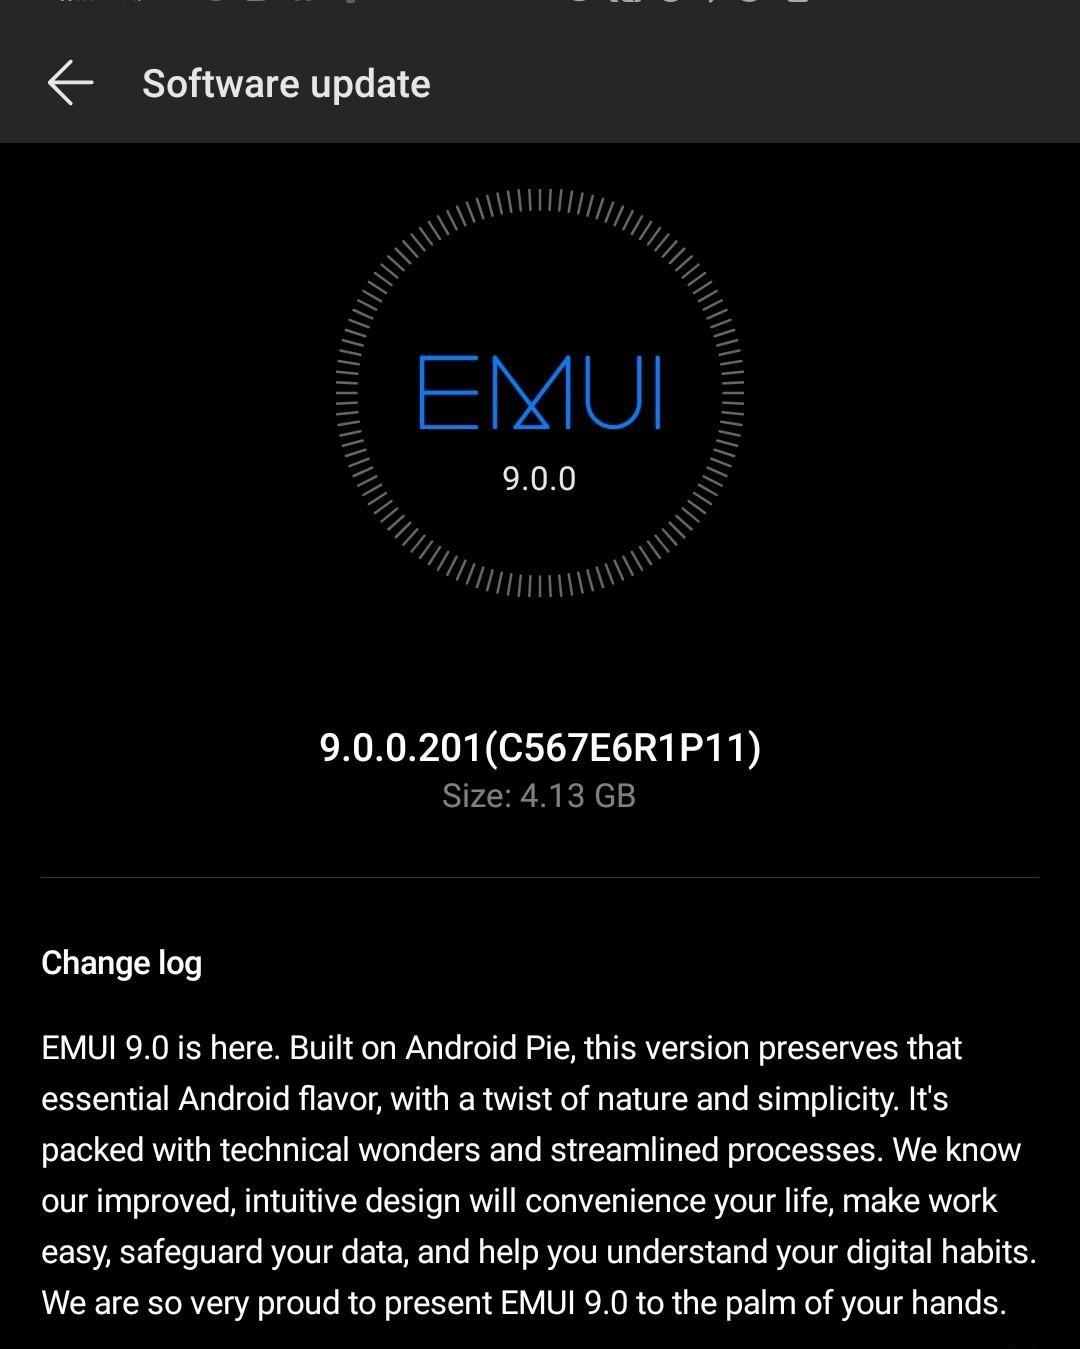 Huawei Mate 10 Pro update: New OTA brings May 2019 security